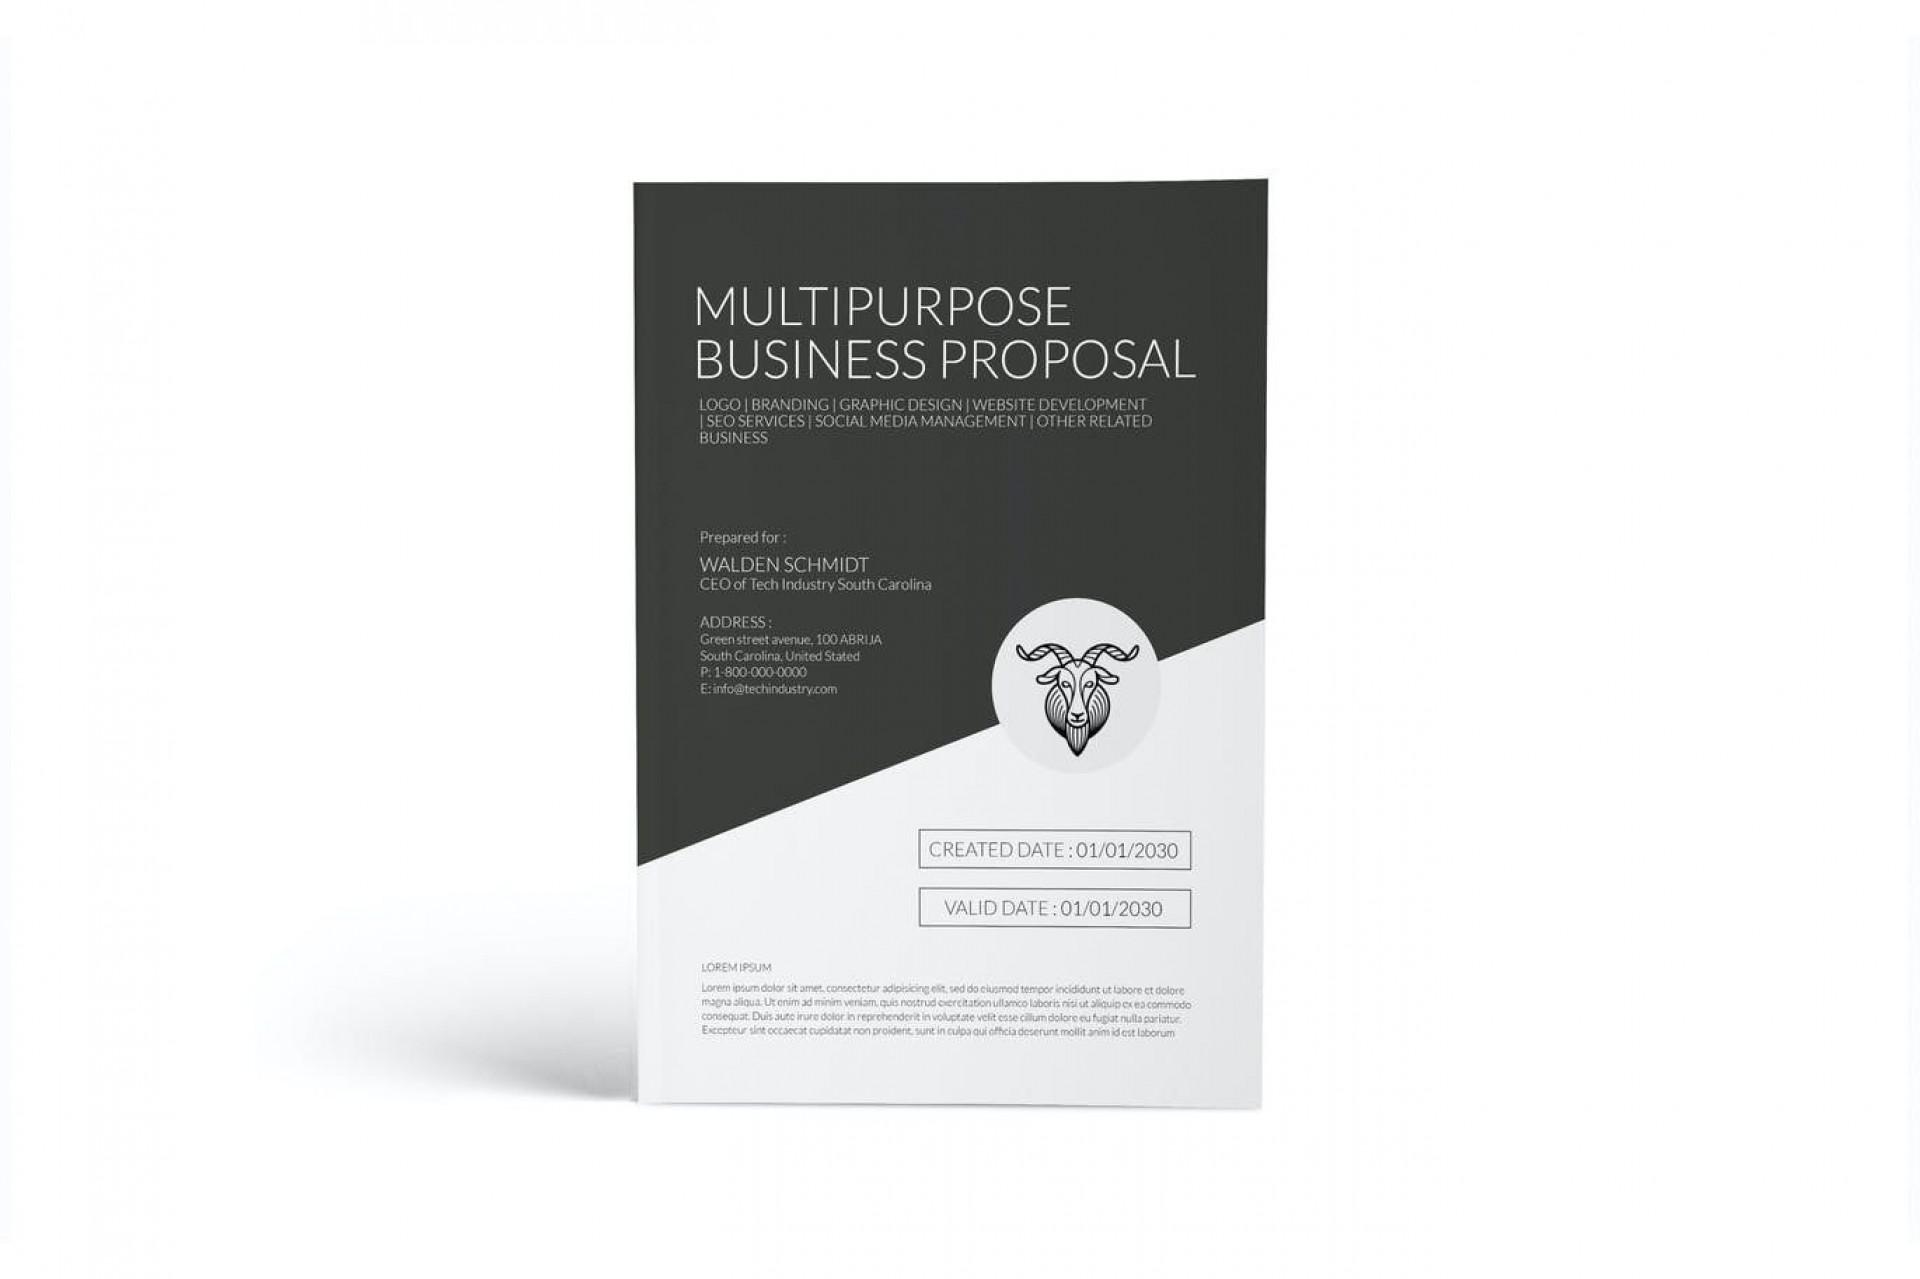 009 Imposing Web Development Proposal Template Pdf Highest Clarity  Sample1920